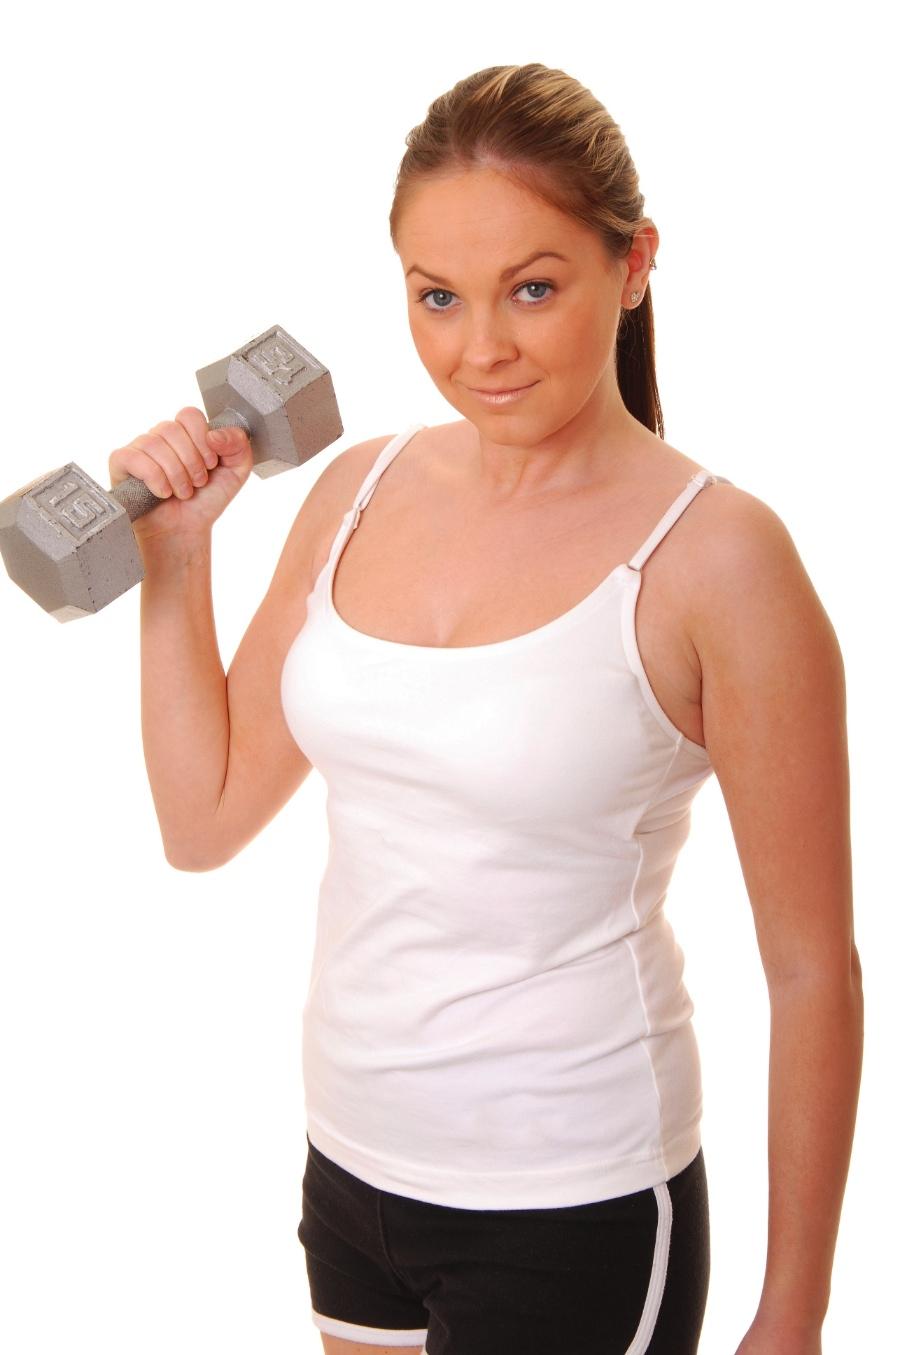 woman-exercising